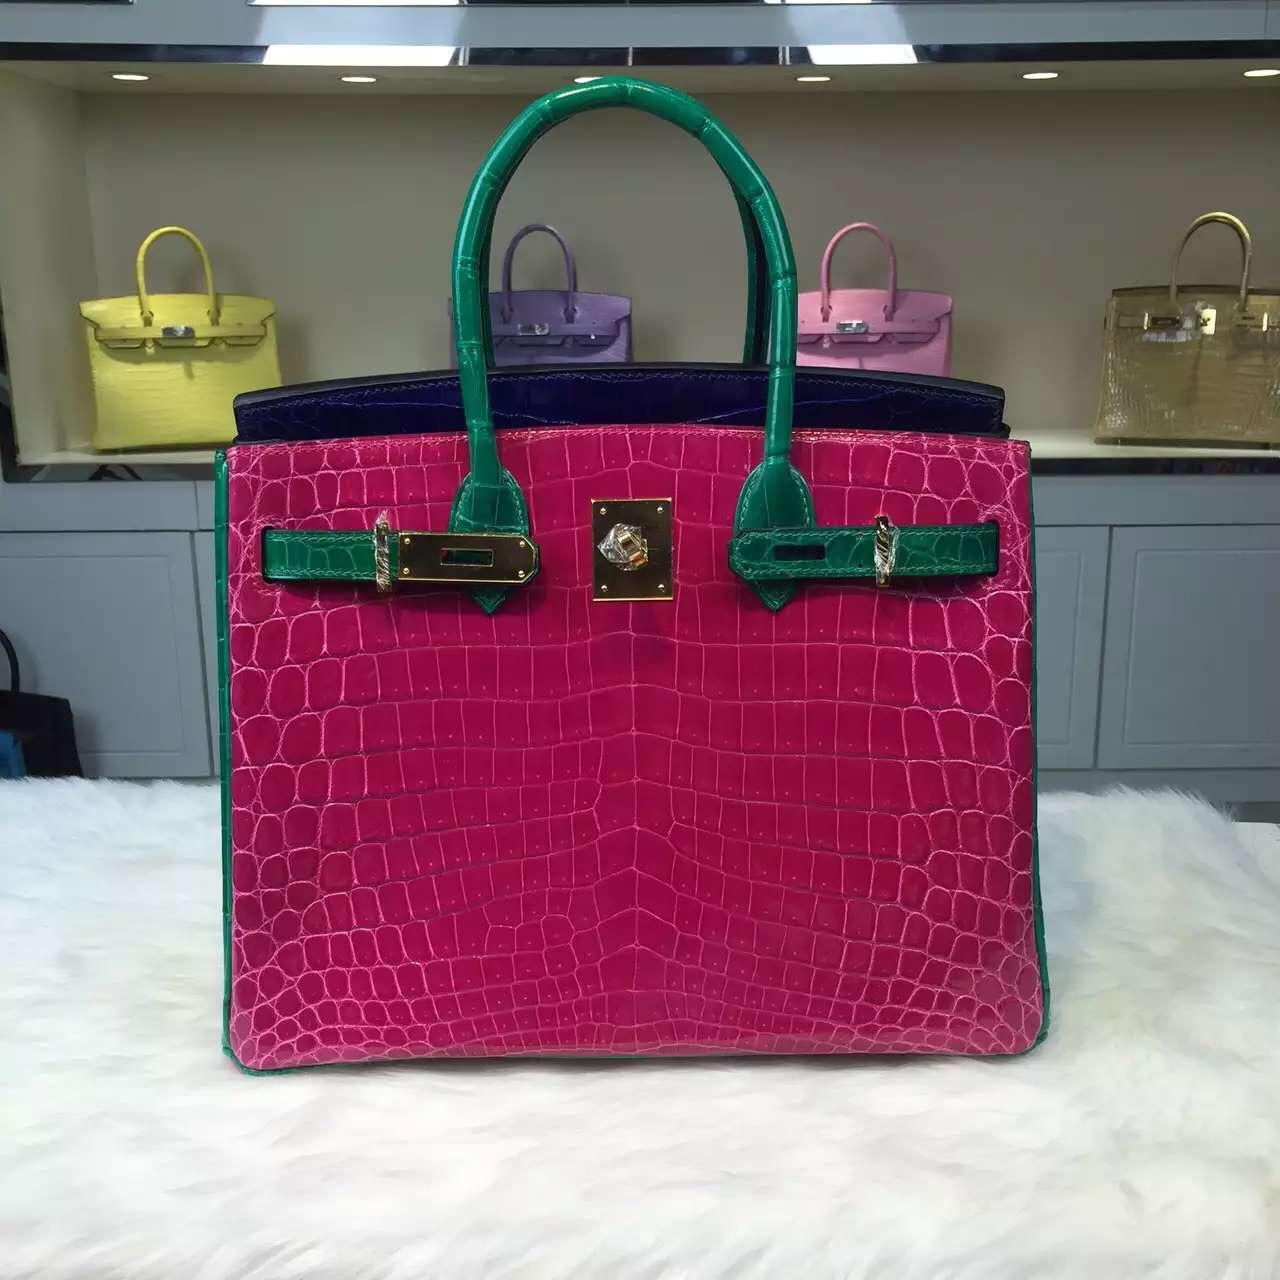 Hermes Color-blocking Original Crocodile Leather Birkin Bag Fashion Women's Handbag 30CM